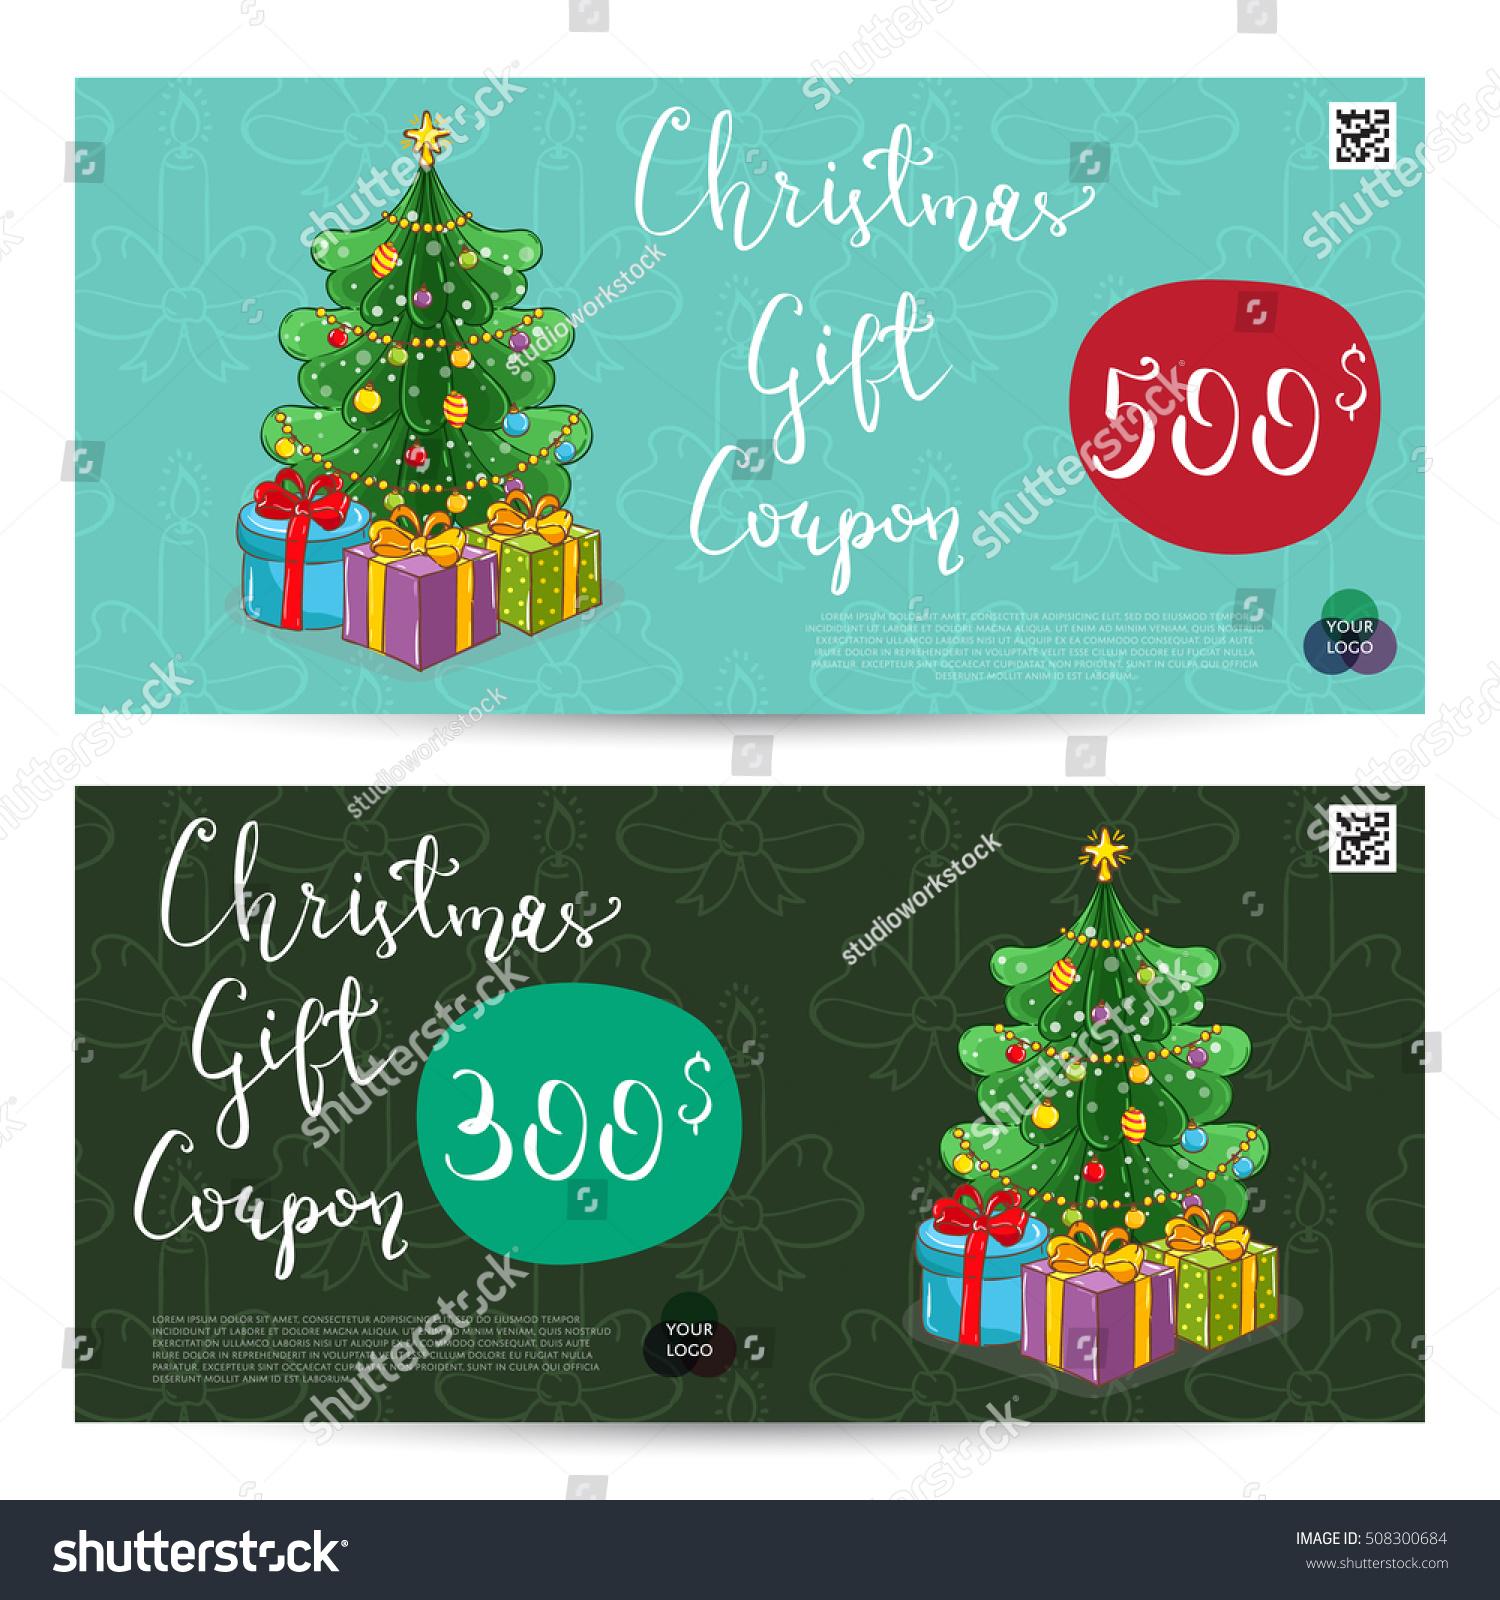 Christmas Voucher Template Vector. Xmas Gift Voucher Layout Or Discount  Voucher. Special Offer Gift